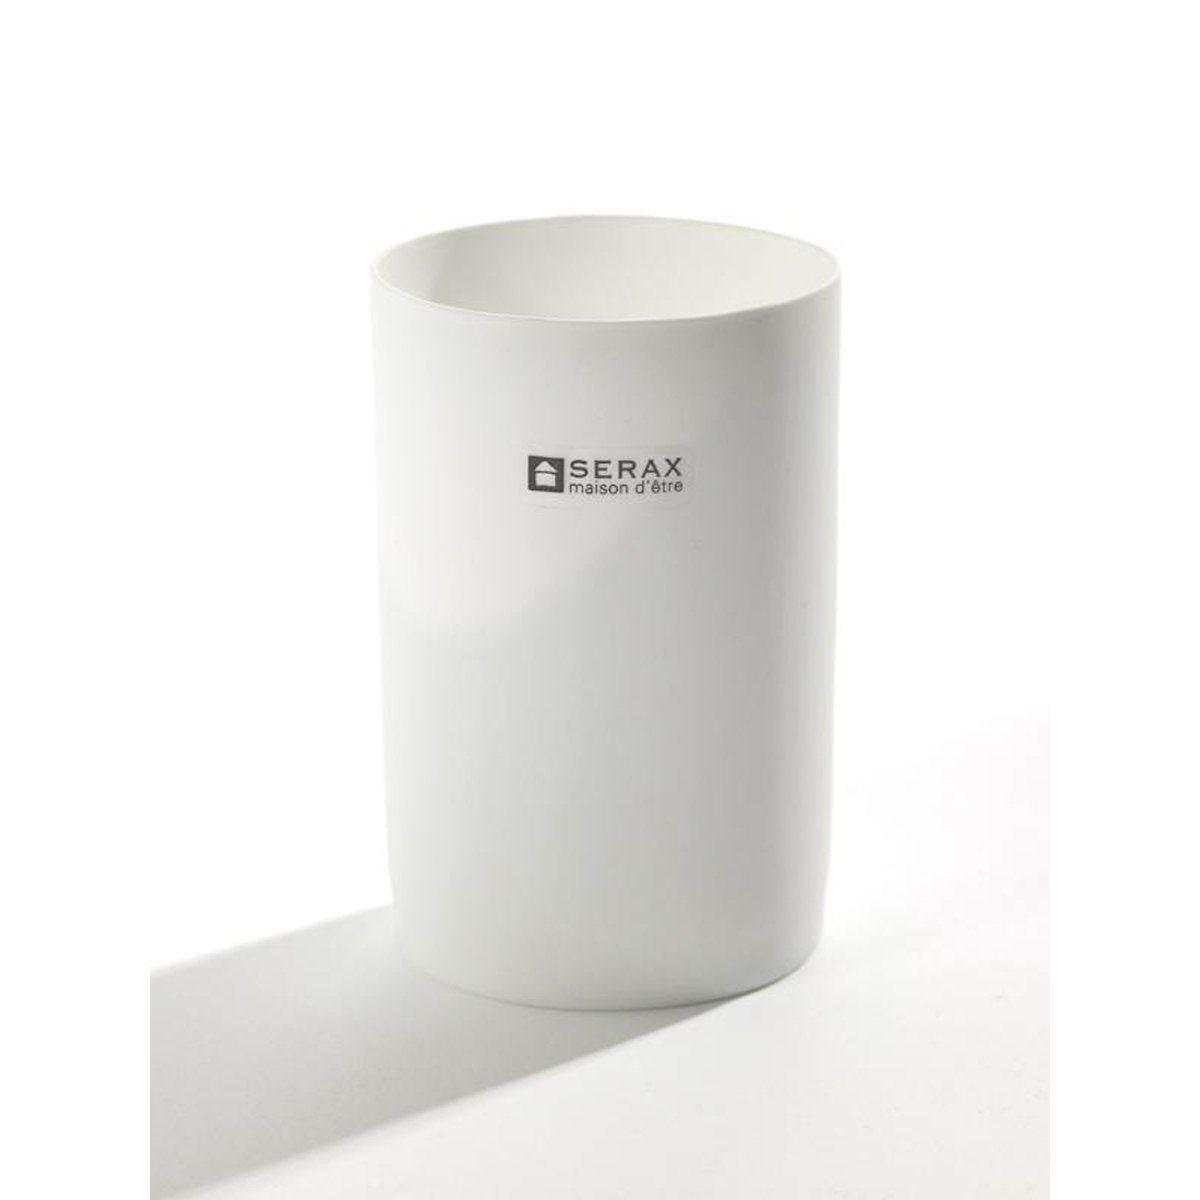 Serax Serax Teelichthalter Porzelan fein groß